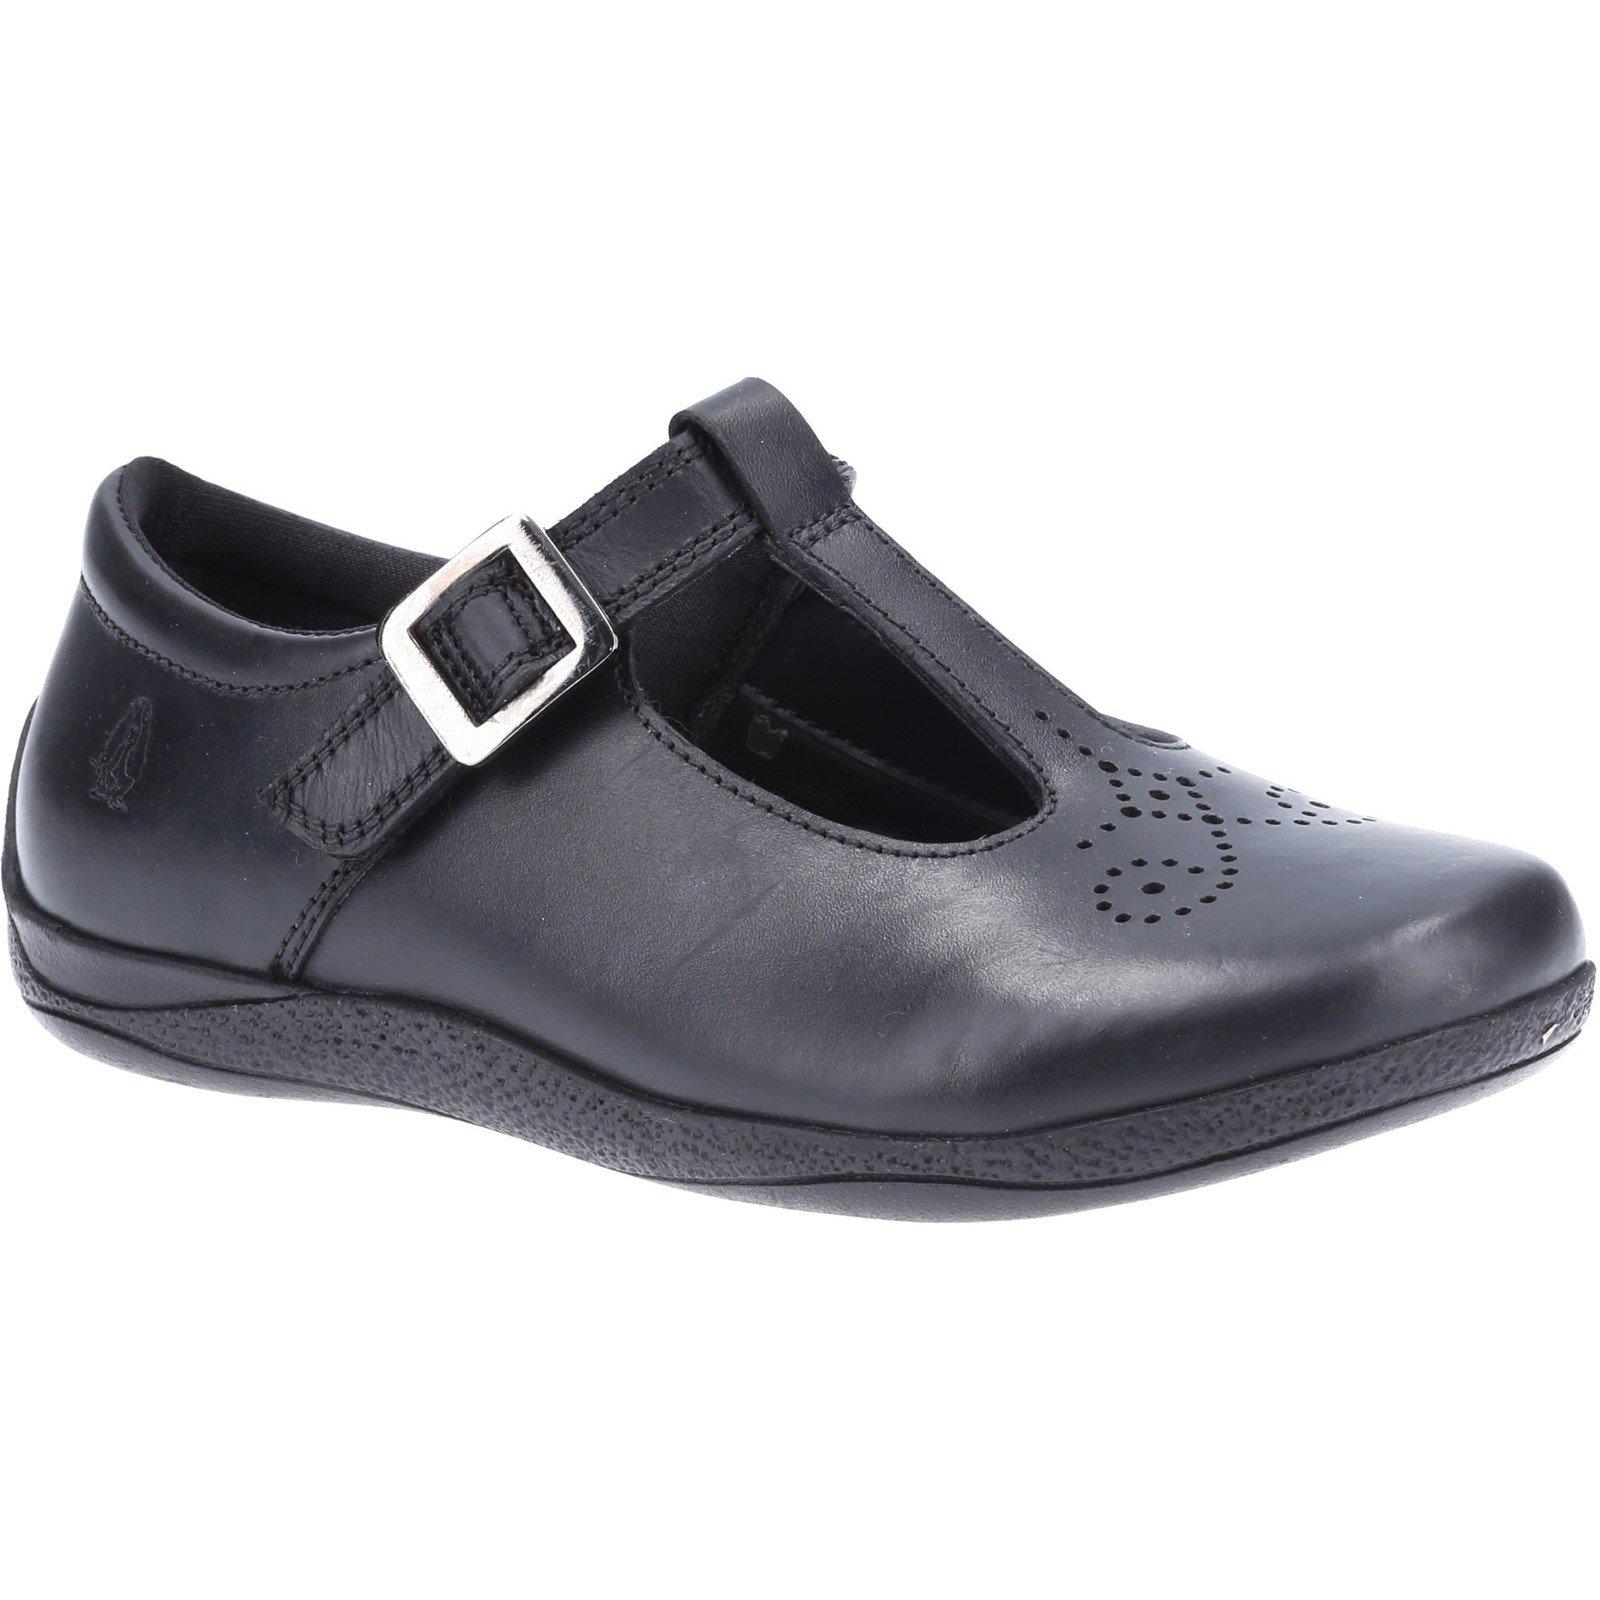 Hush Puppies Kid's Eliza Junior School Shoe Black 32589 - Black 1